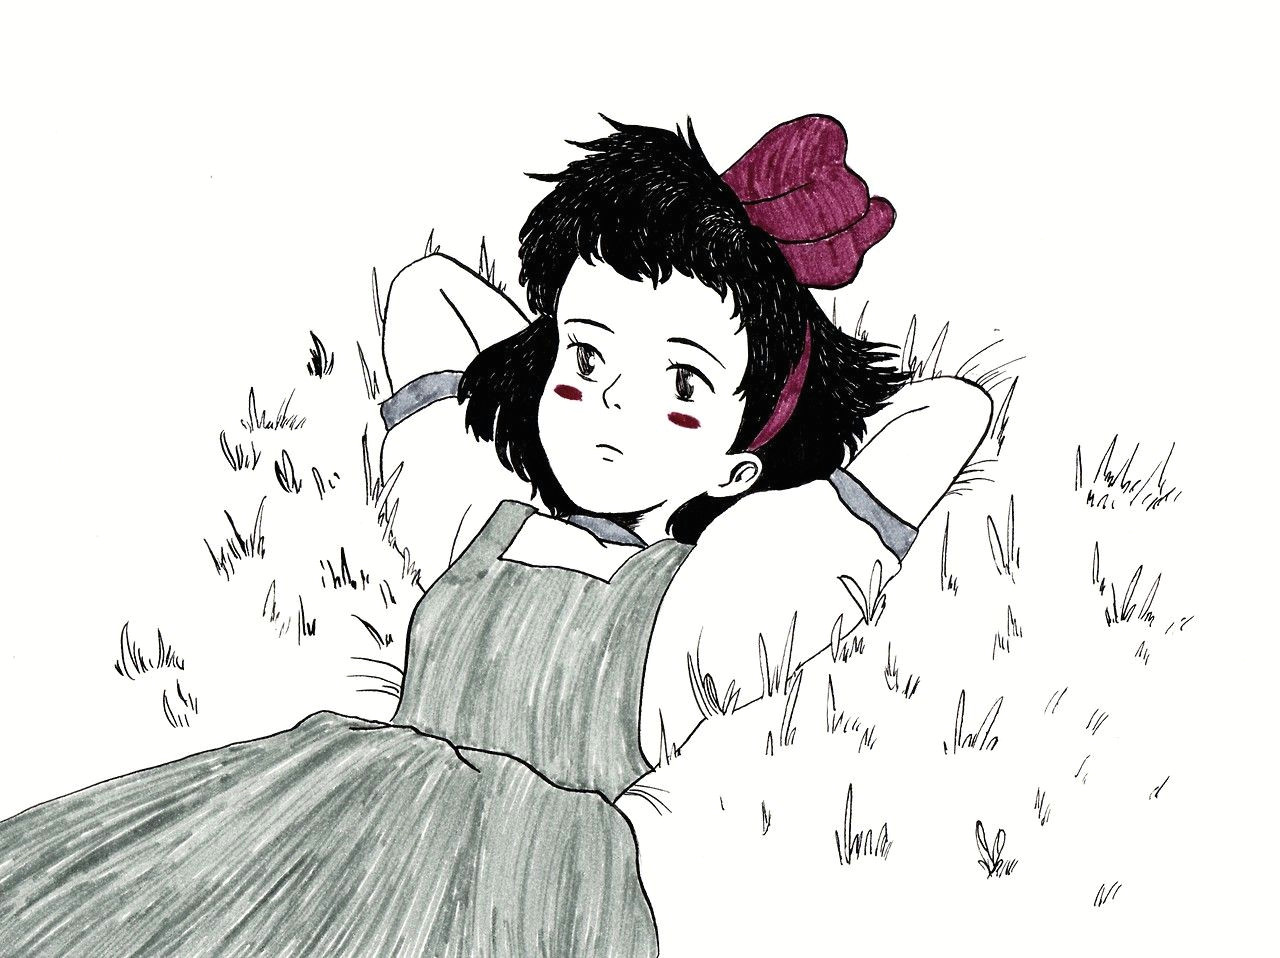 aesthetic drawings tumblr